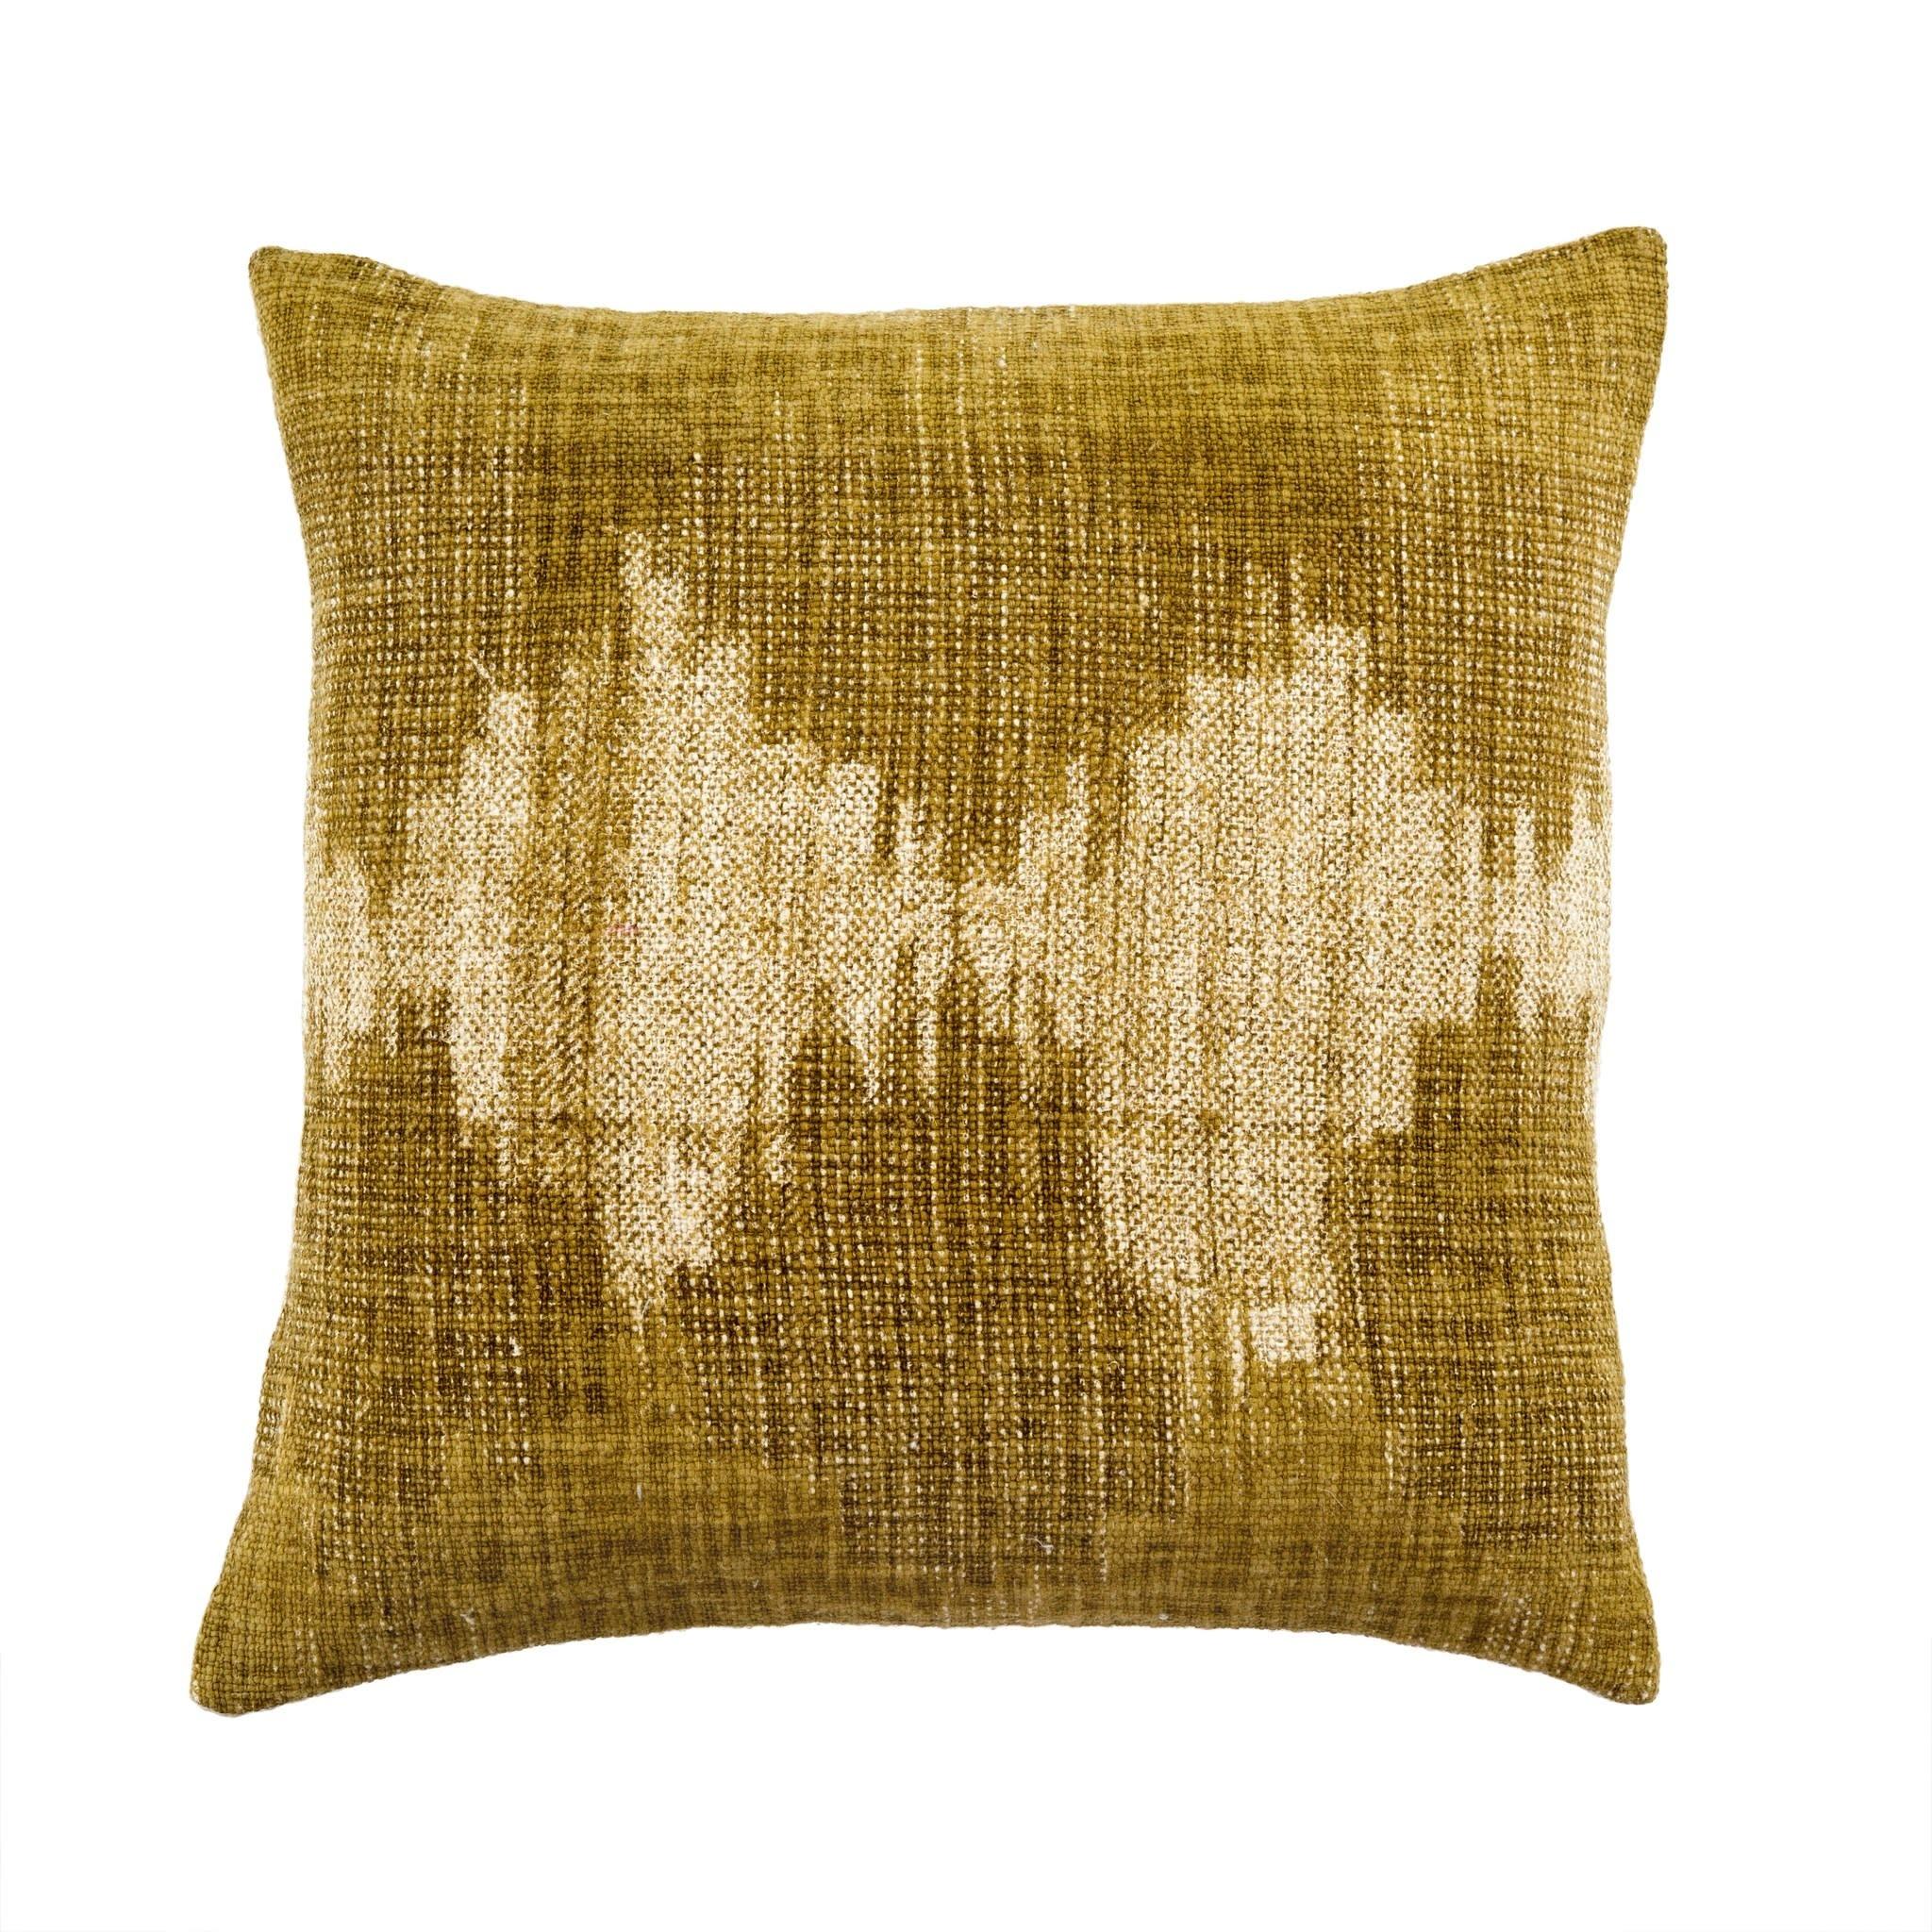 Mojave Cushion 20 x 20